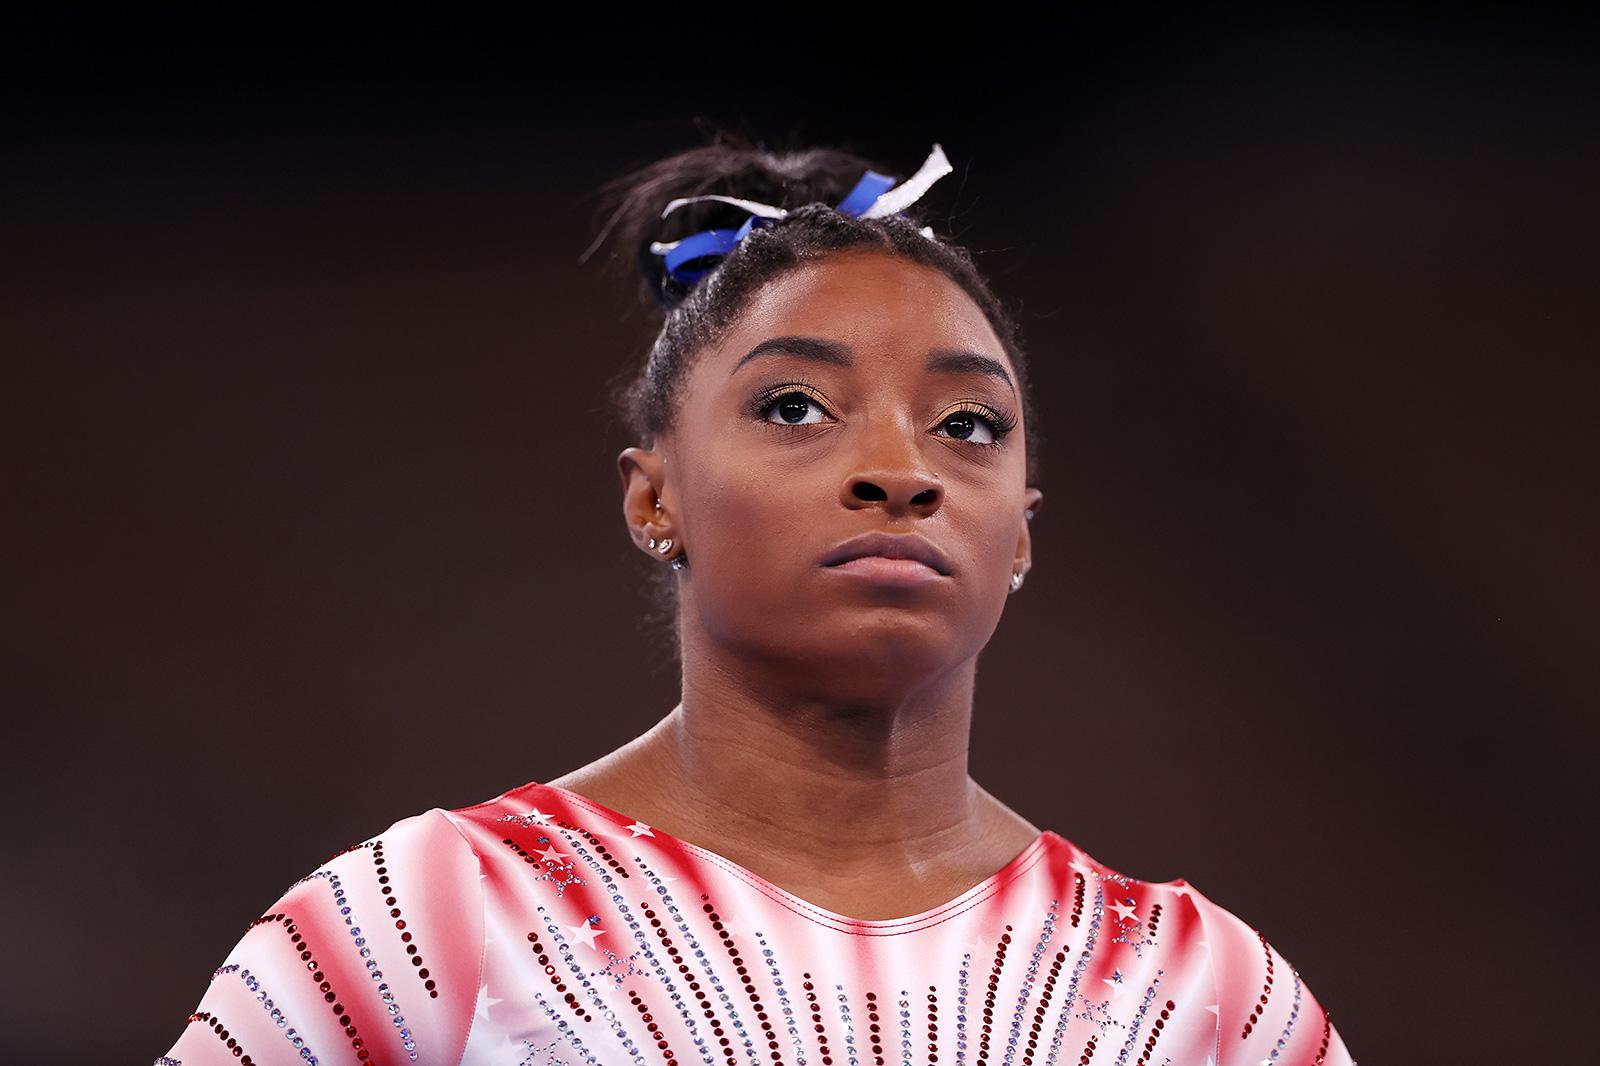 Team USA's Simone Biles watches warm ups prior to the balance beam final on Tuesday.